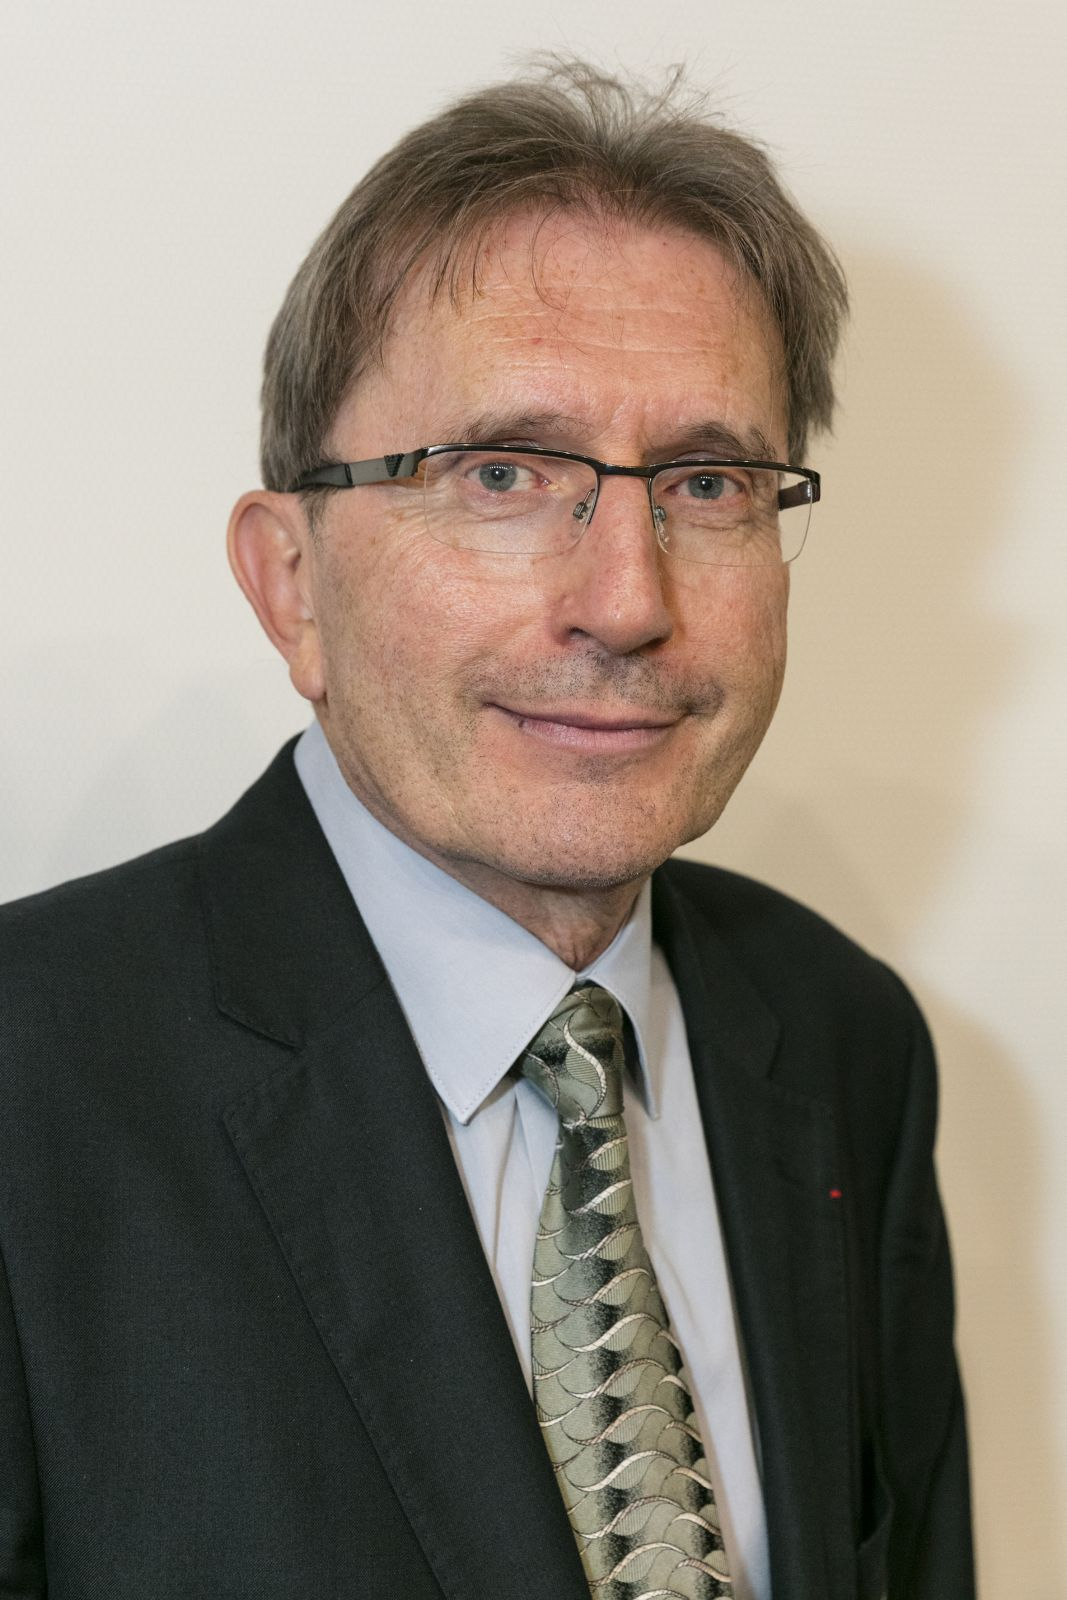 Christian Brodhag